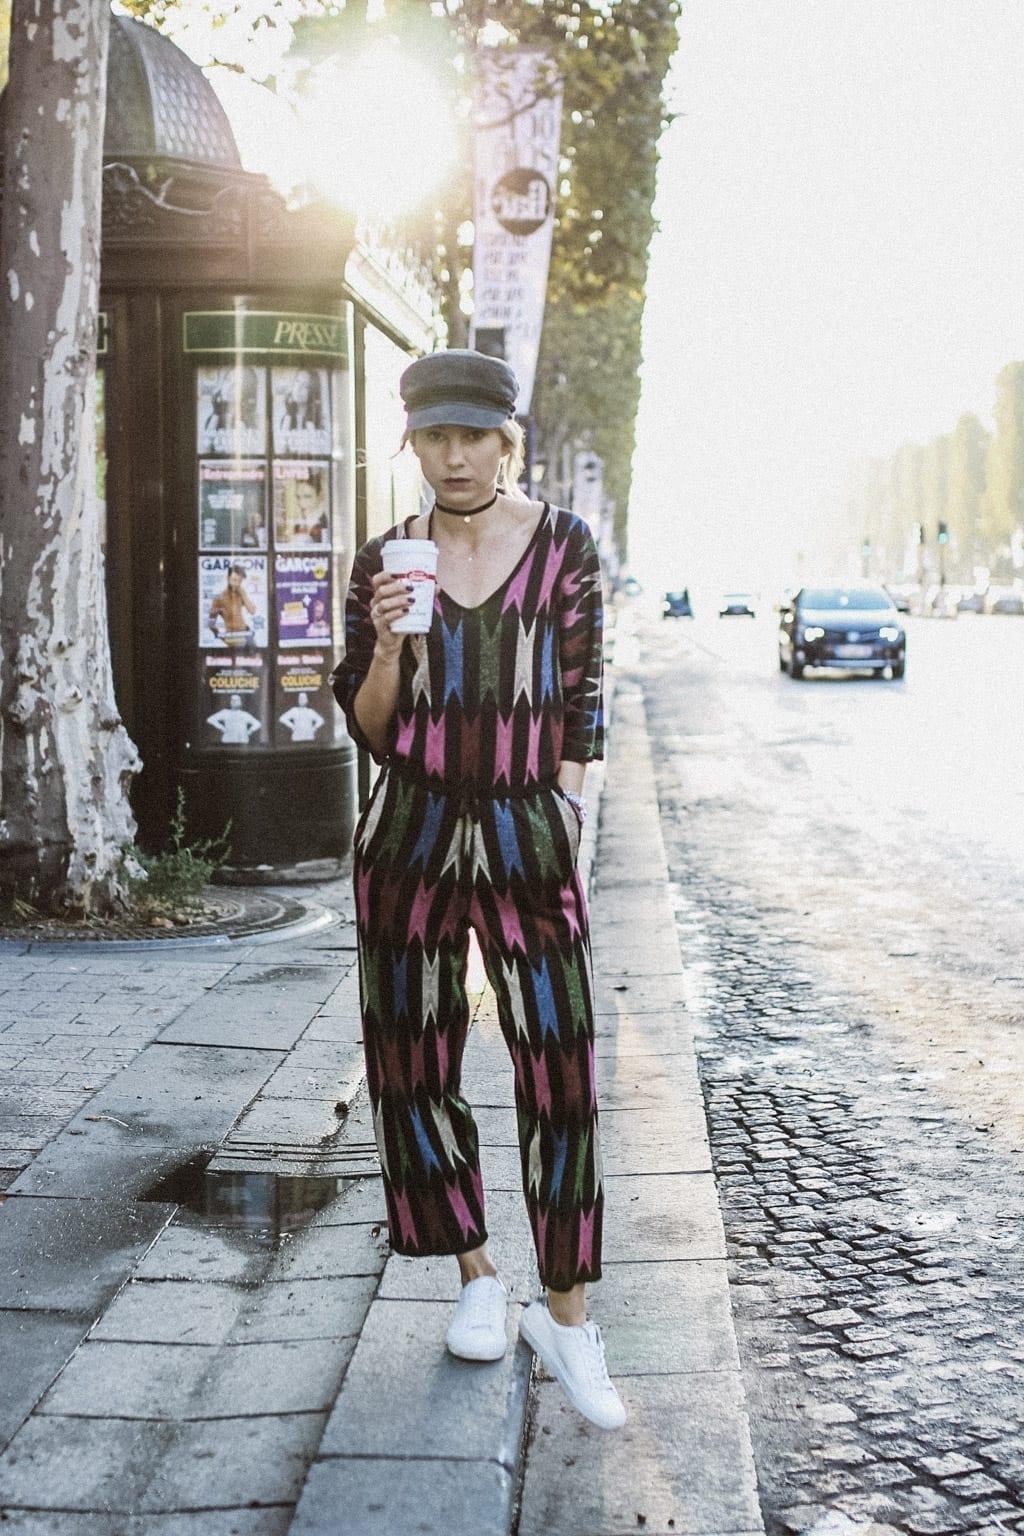 ck-constantlyk-com-paris-fashion-karin-kaswurm-georg-teigl-street-style-9612